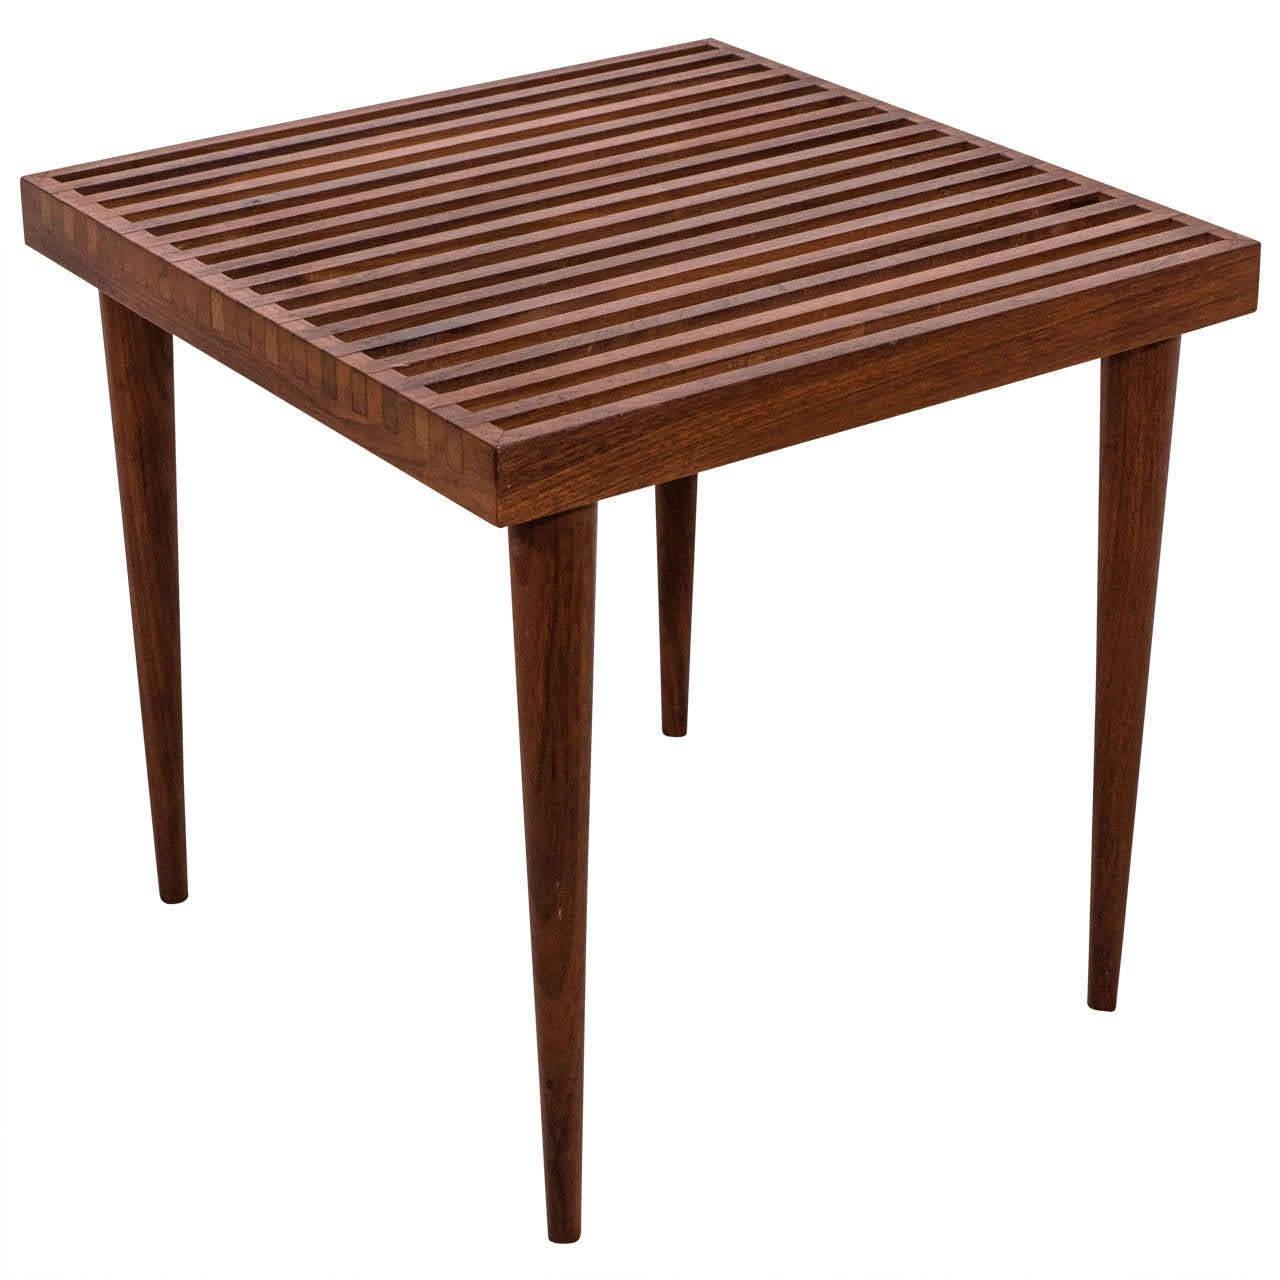 vintage scandinavian modern slat wood side or end table